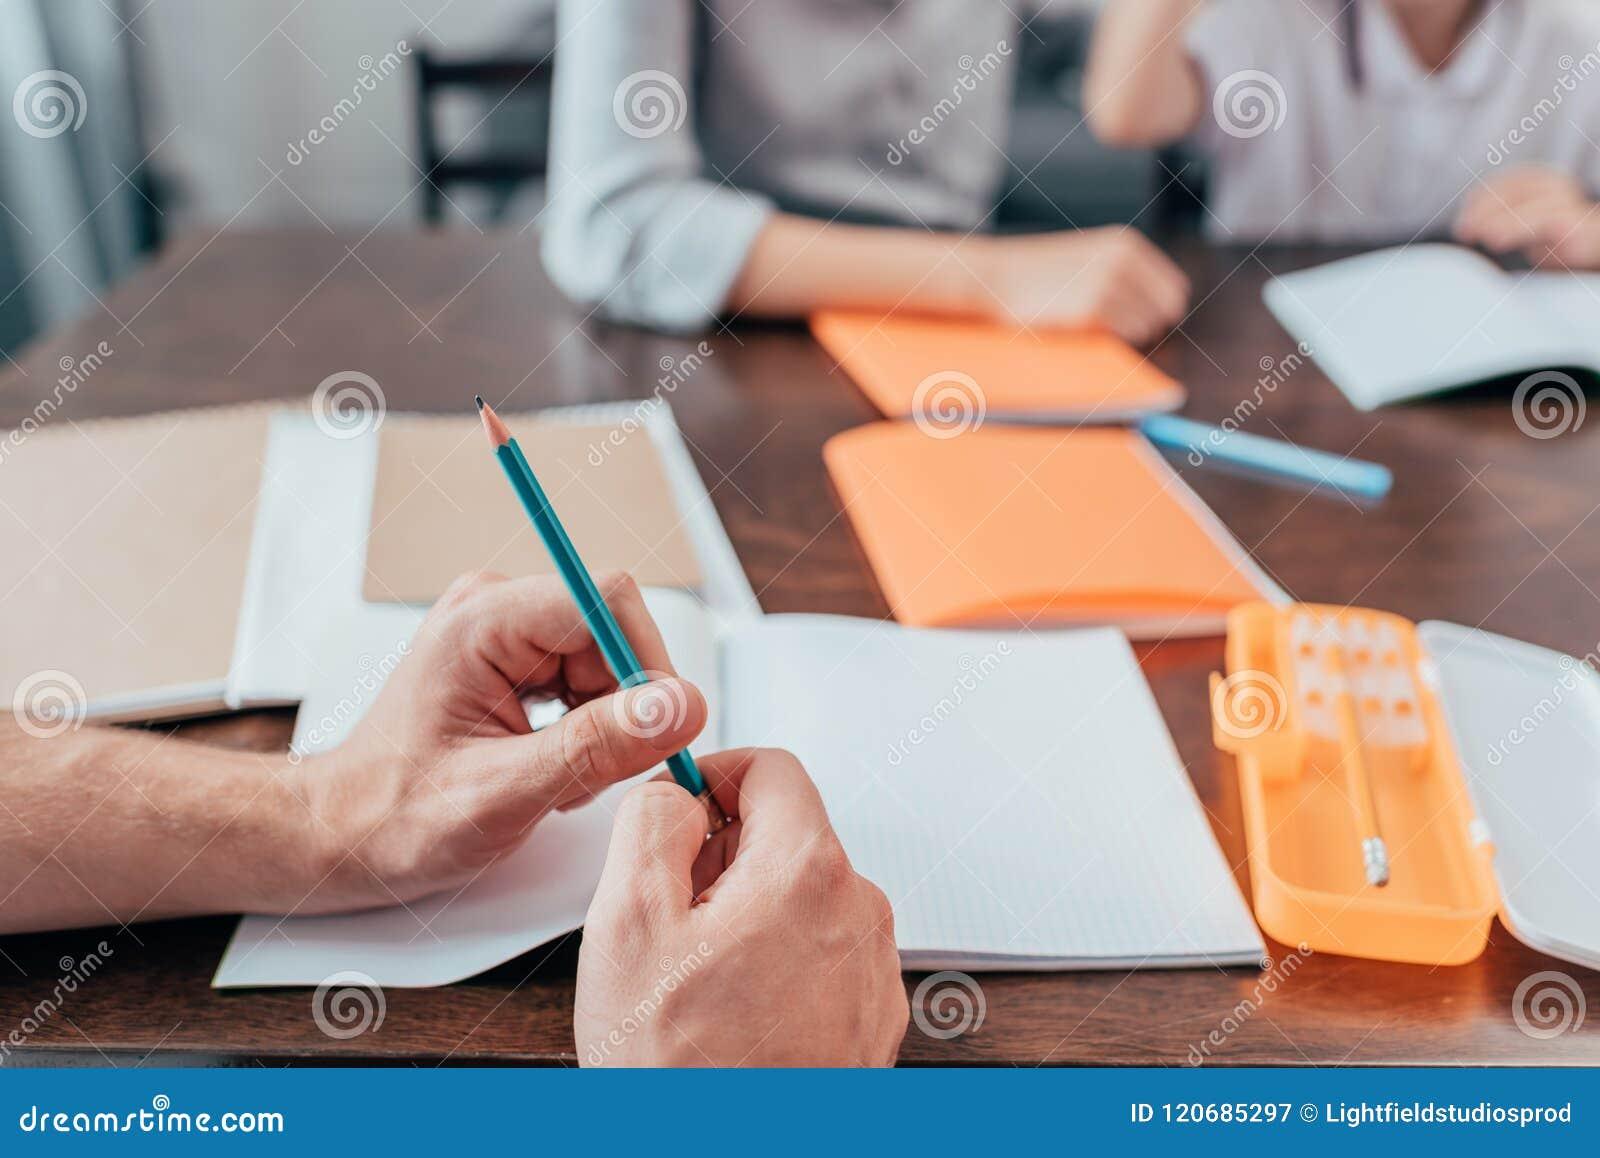 конец-вверх снятый человека держа карандаш